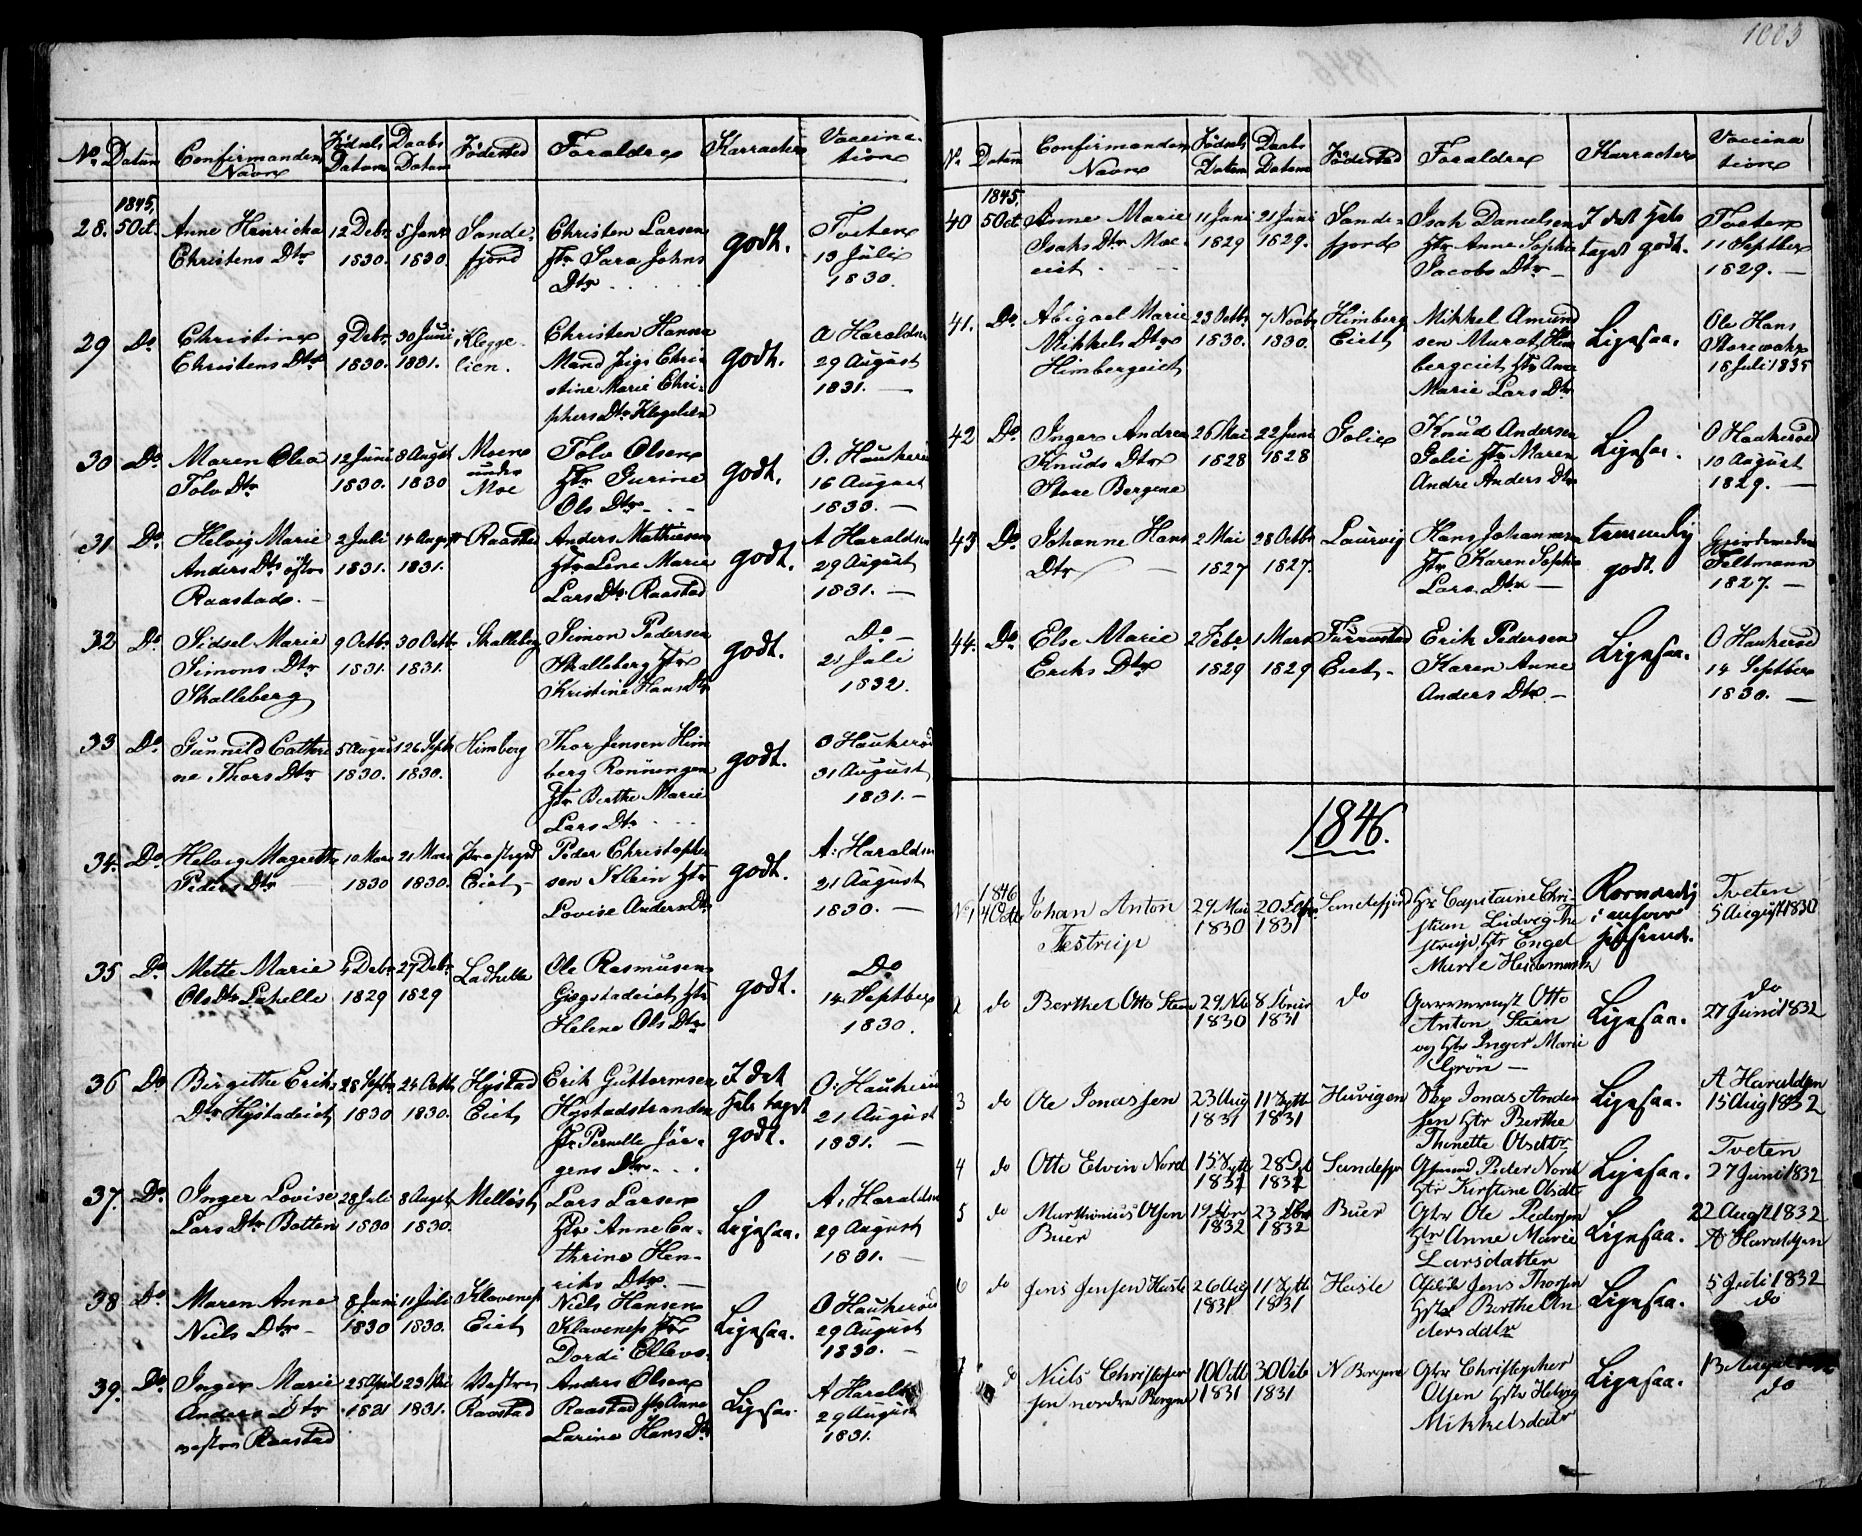 SAKO, Sandar kirkebøker, F/Fa/L0005: Parish register (official) no. 5, 1832-1847, p. 1002-1003